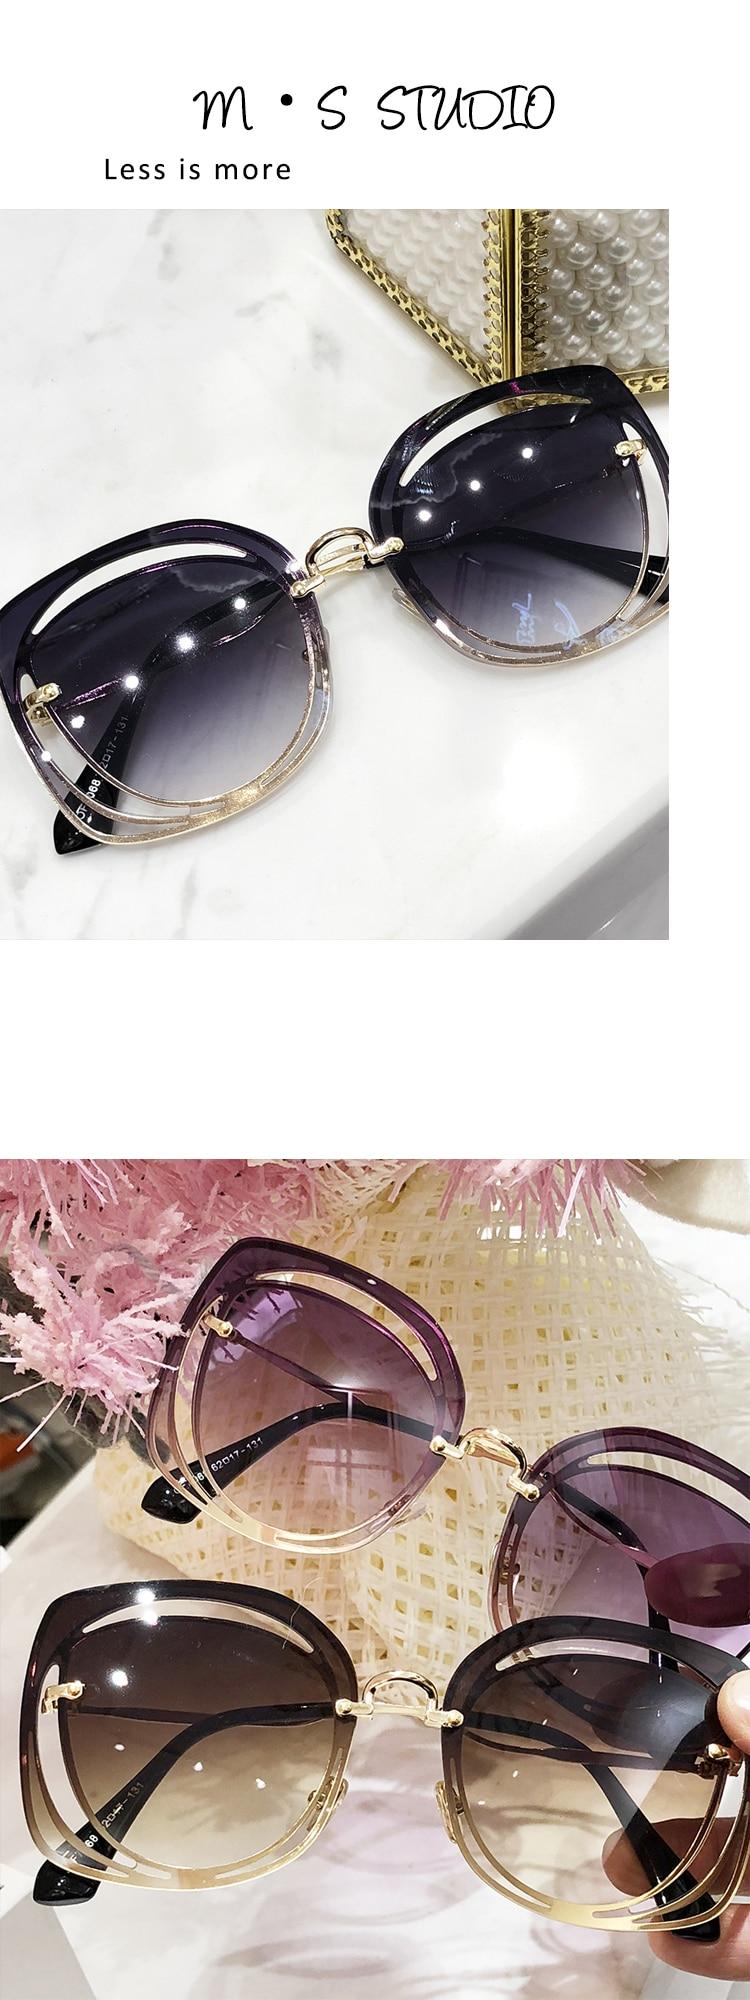 7647b42a8b3 2018 Women Luxury Sunglasses UV400 – Sellimart